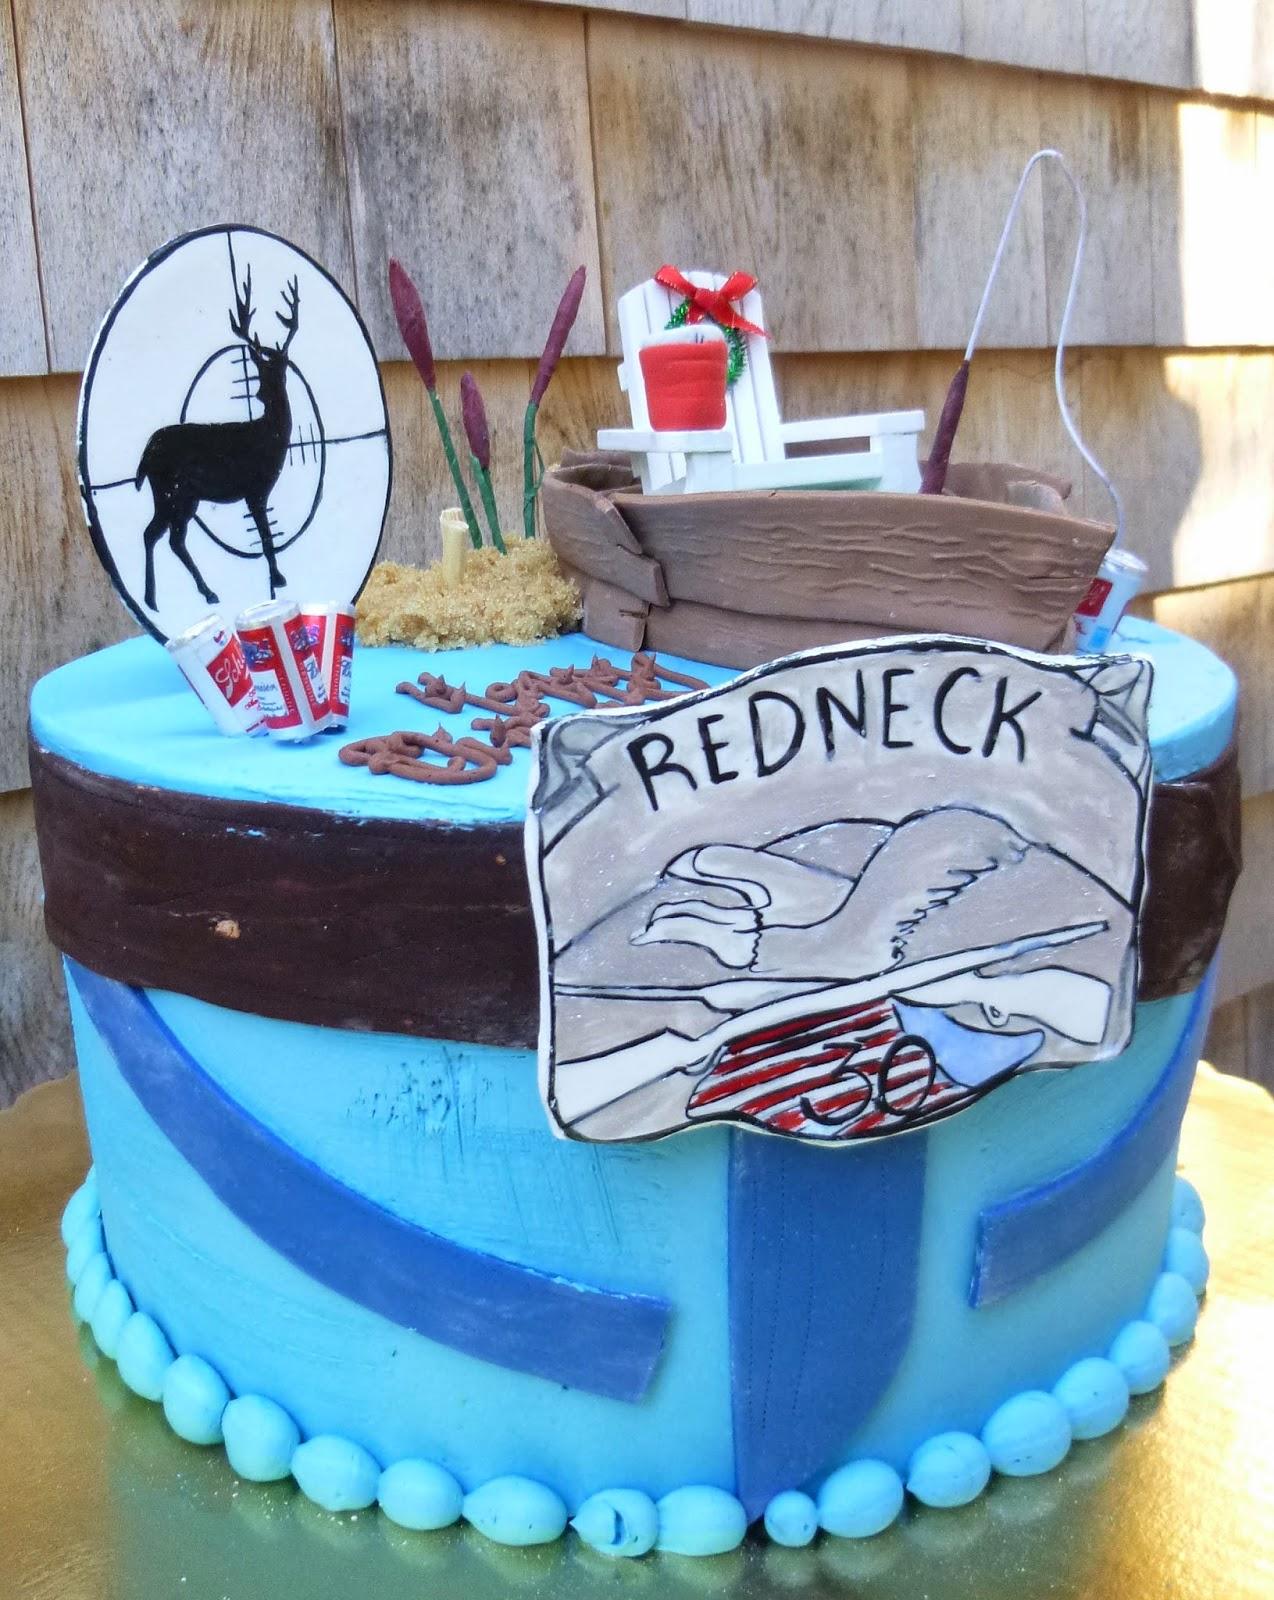 Artisan Bake Shop Redneck 30th Birthday Cake